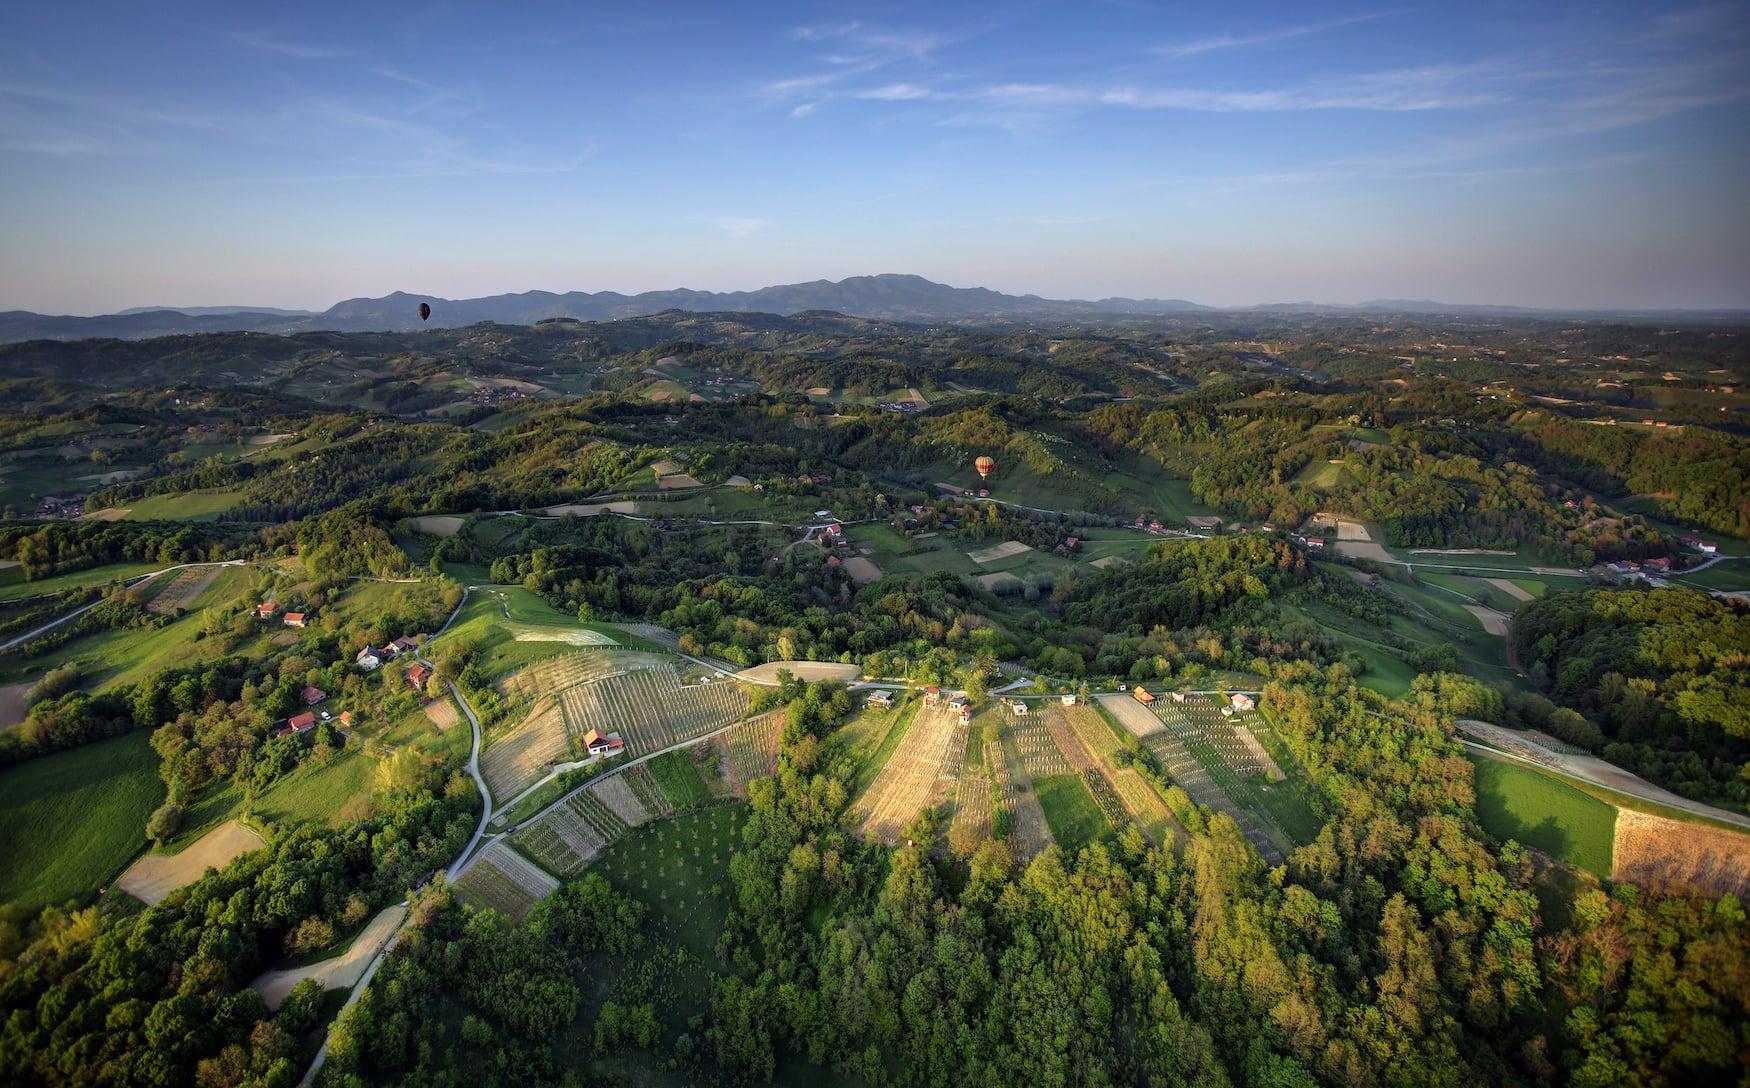 Heißluftballon über grüner Landschaft in Kroatien